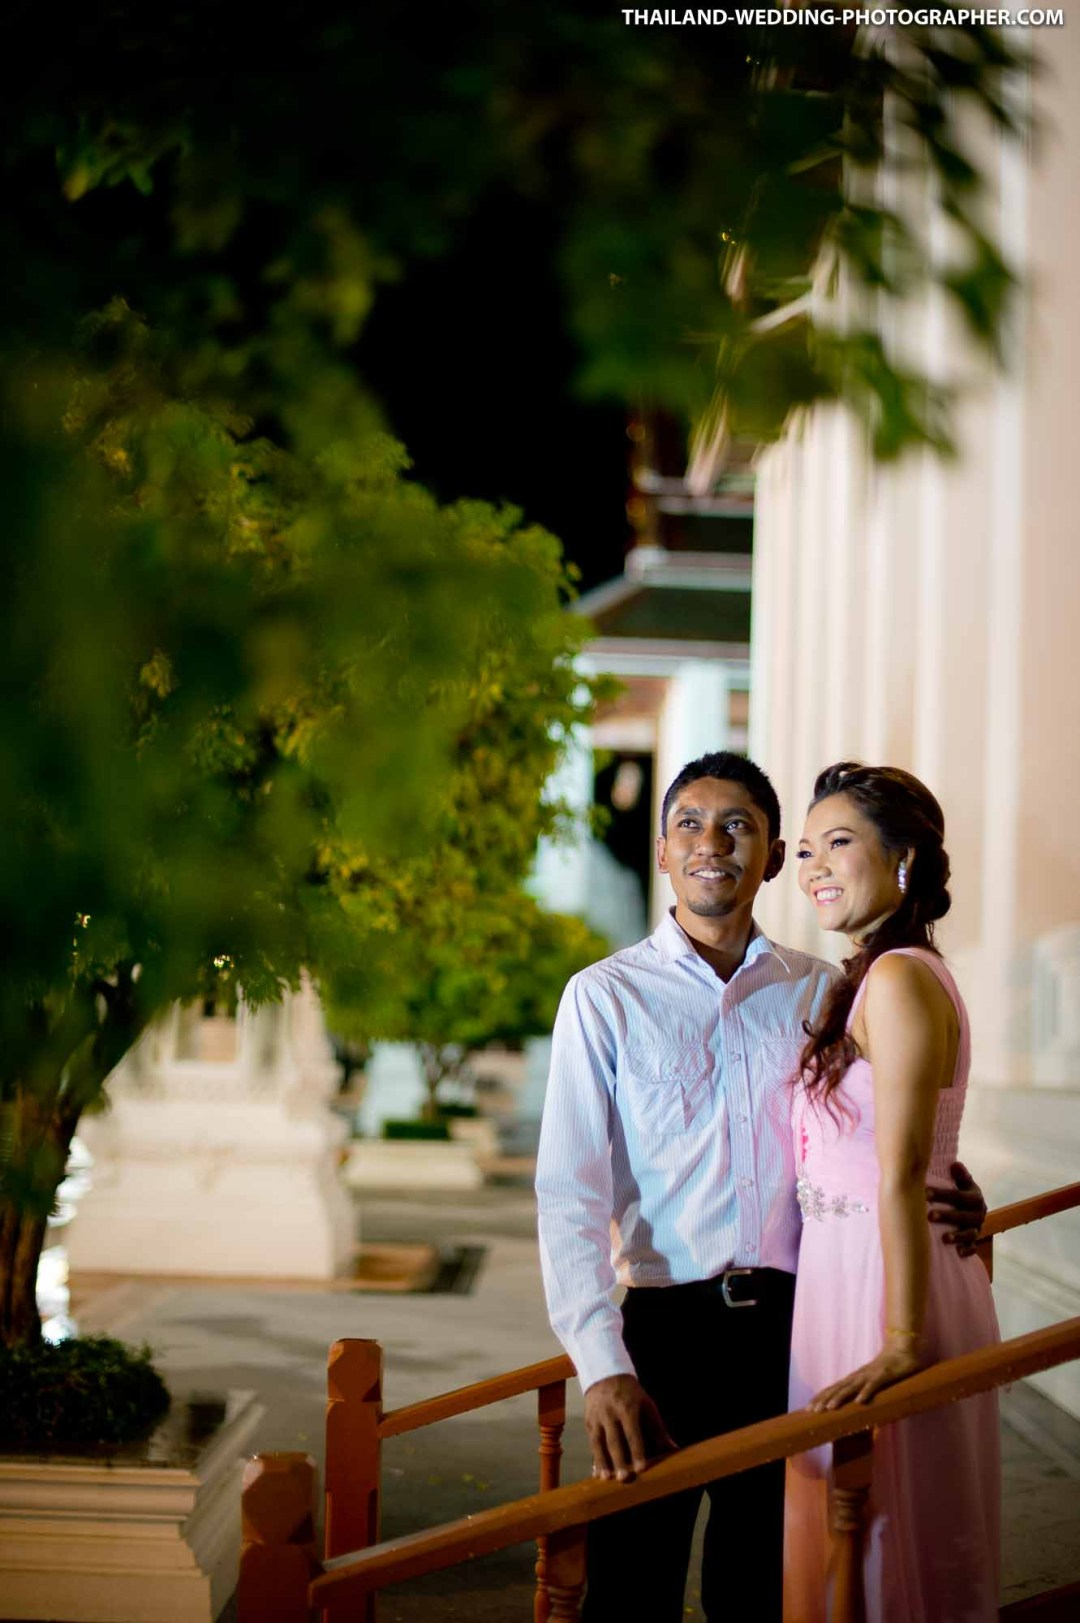 Loha Prasart Bangkok Thailand Wedding Photography